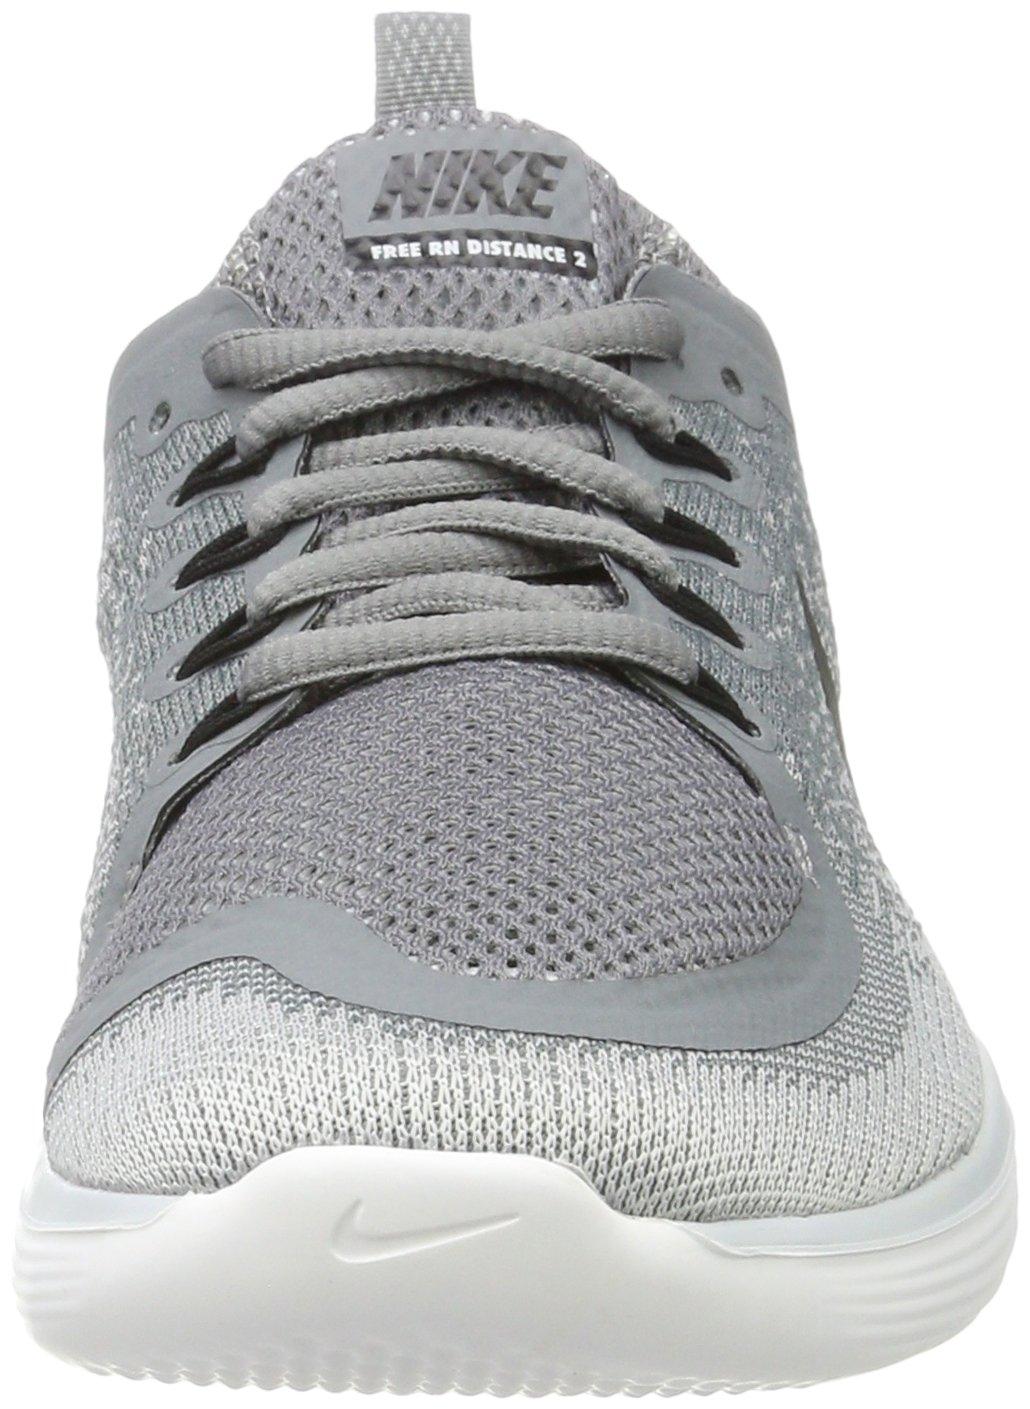 bc924bf2a96 ... Nike Women s Women s Women s Free Rn Distance 2 Running Shoe B01N4Q6M9I  9 B(M) ...